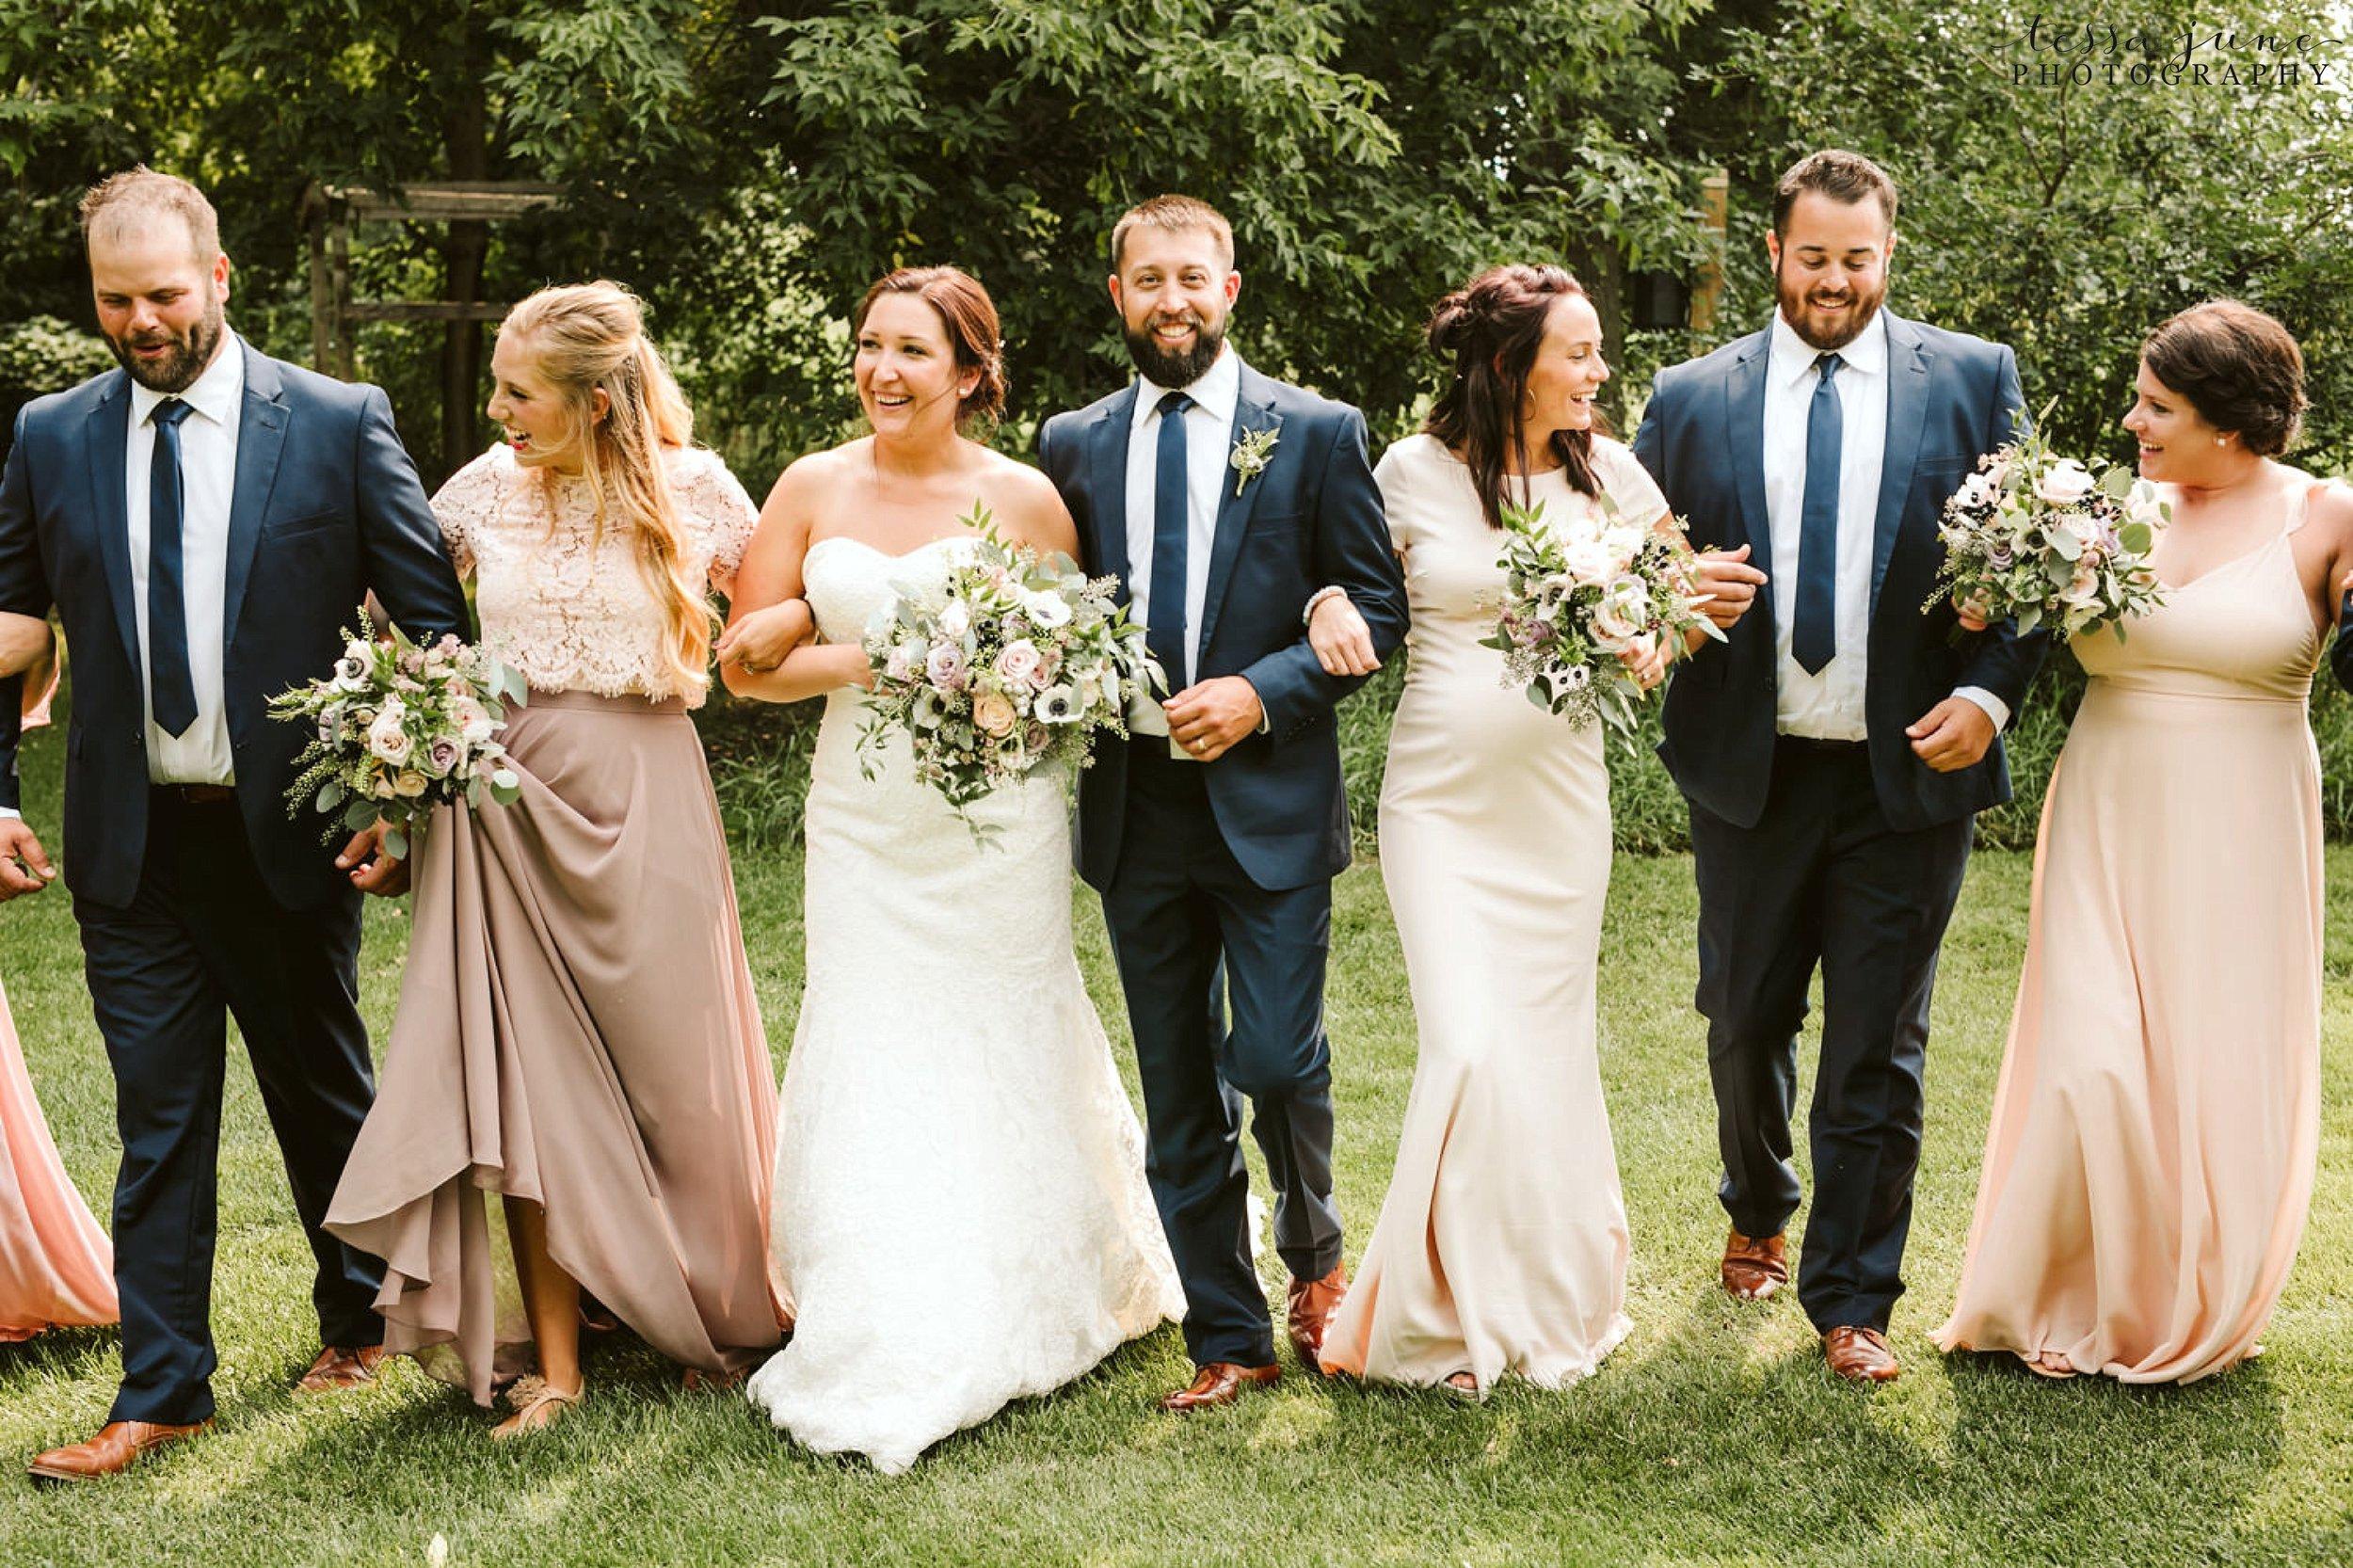 gathered-oaks-barn-wedding-alexandria-minnesota-4.jpg